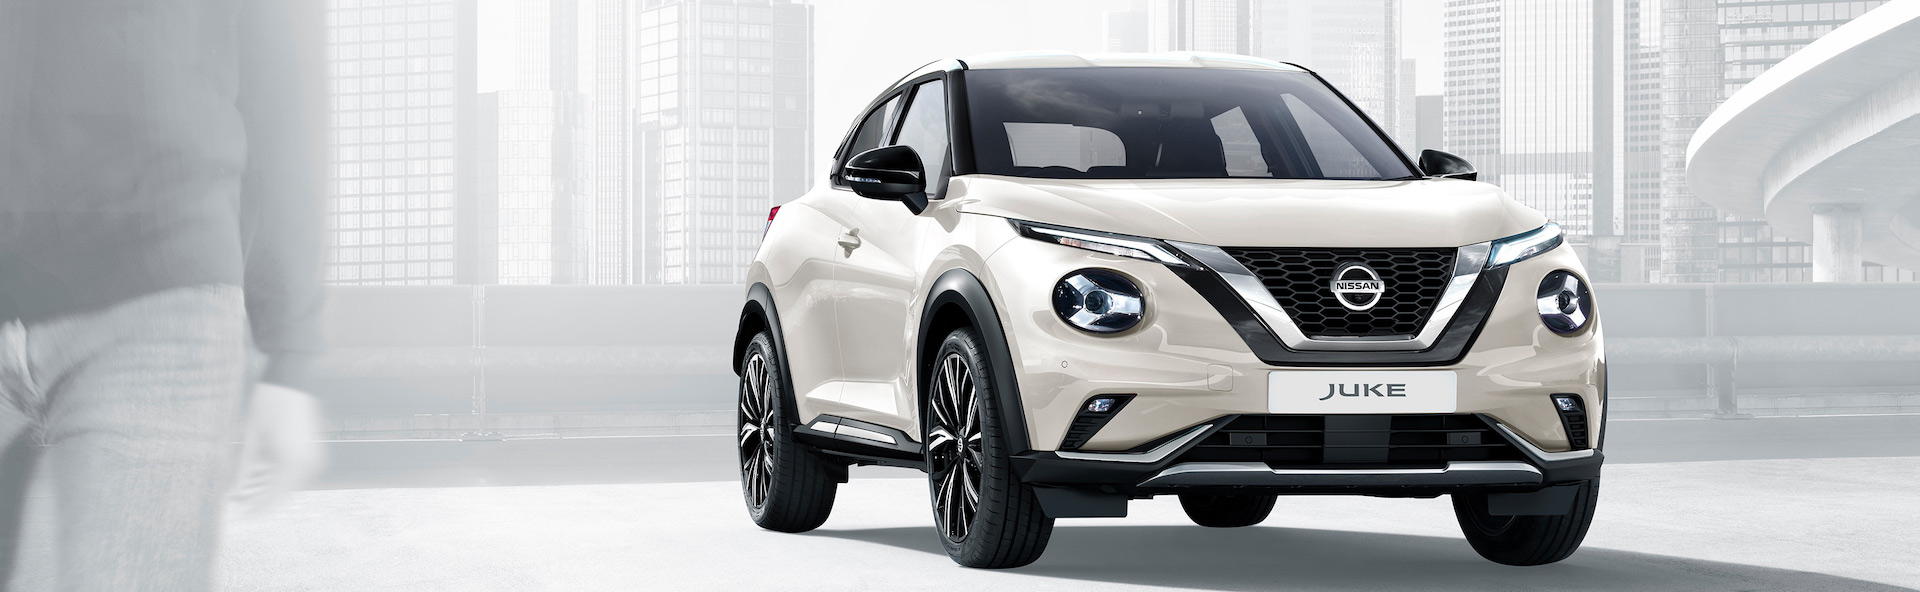 Nissan Juke: como comprar na Maia